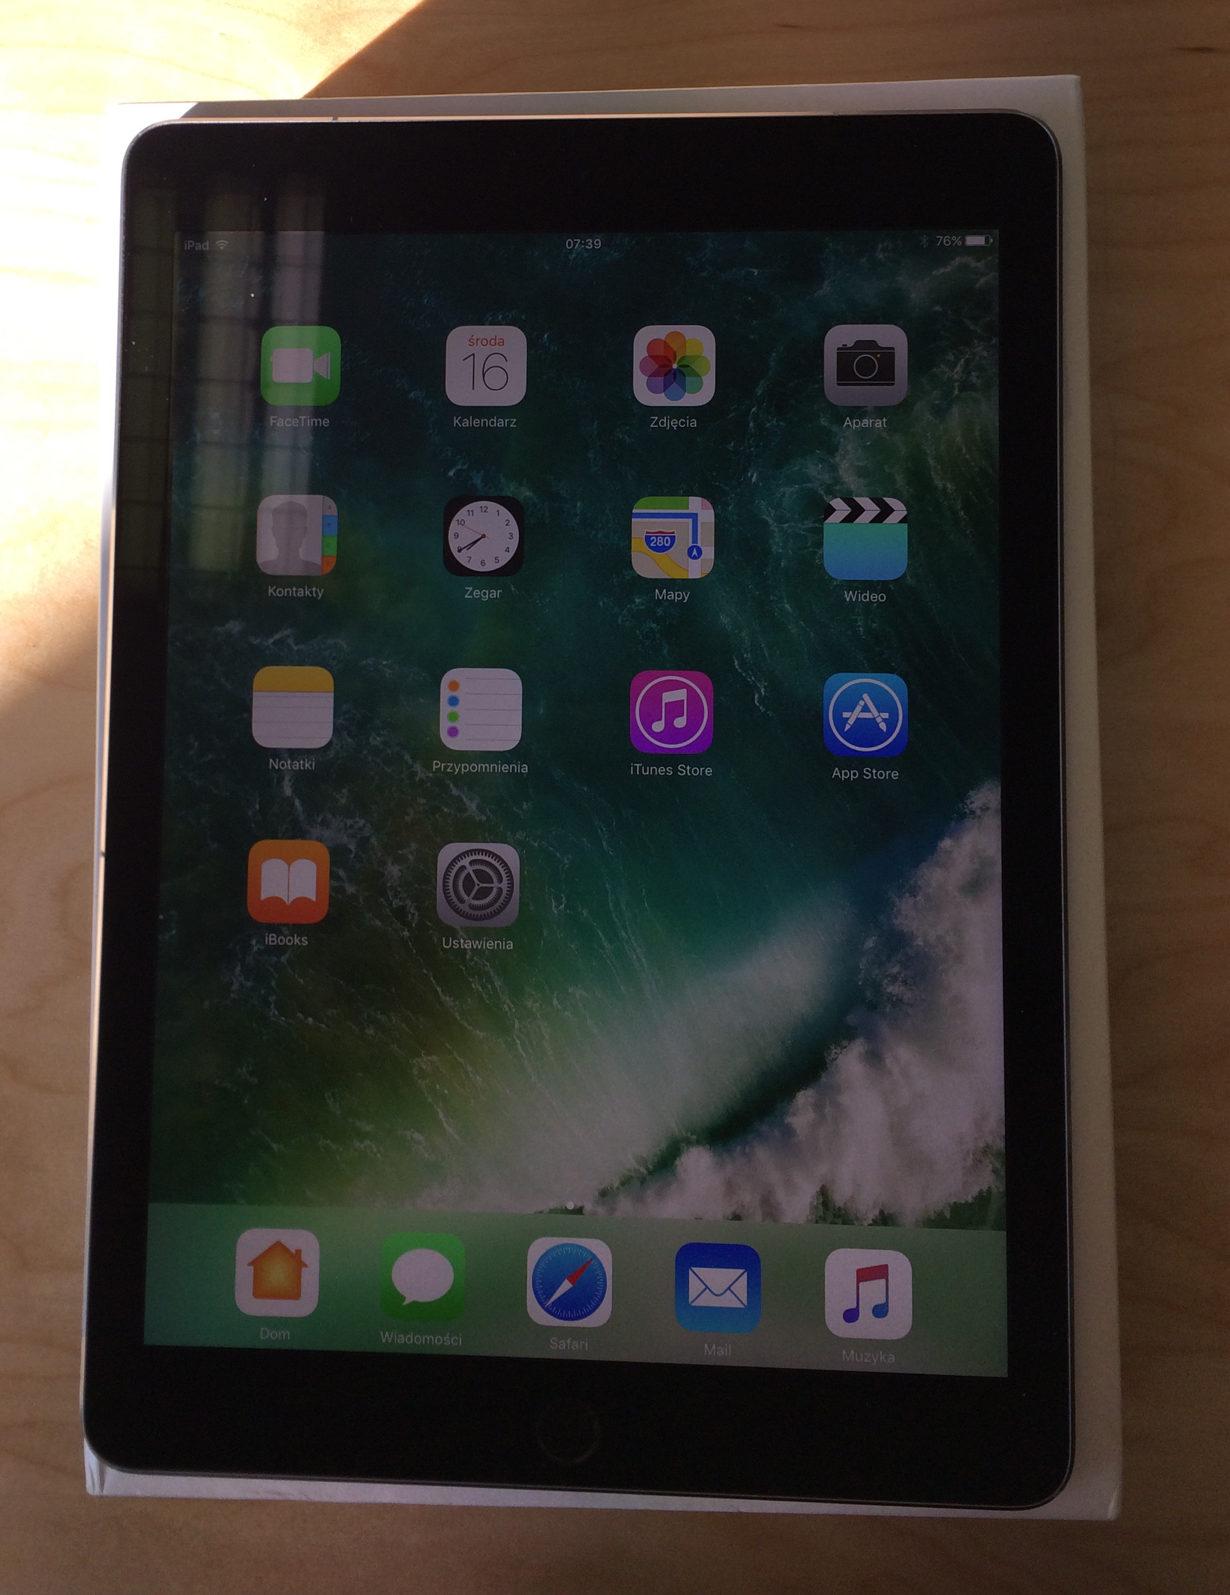 iPad Pro 9.7-inch (Wi-Fi + 4G), 32 GB, SPACE GRAY, imagen 1